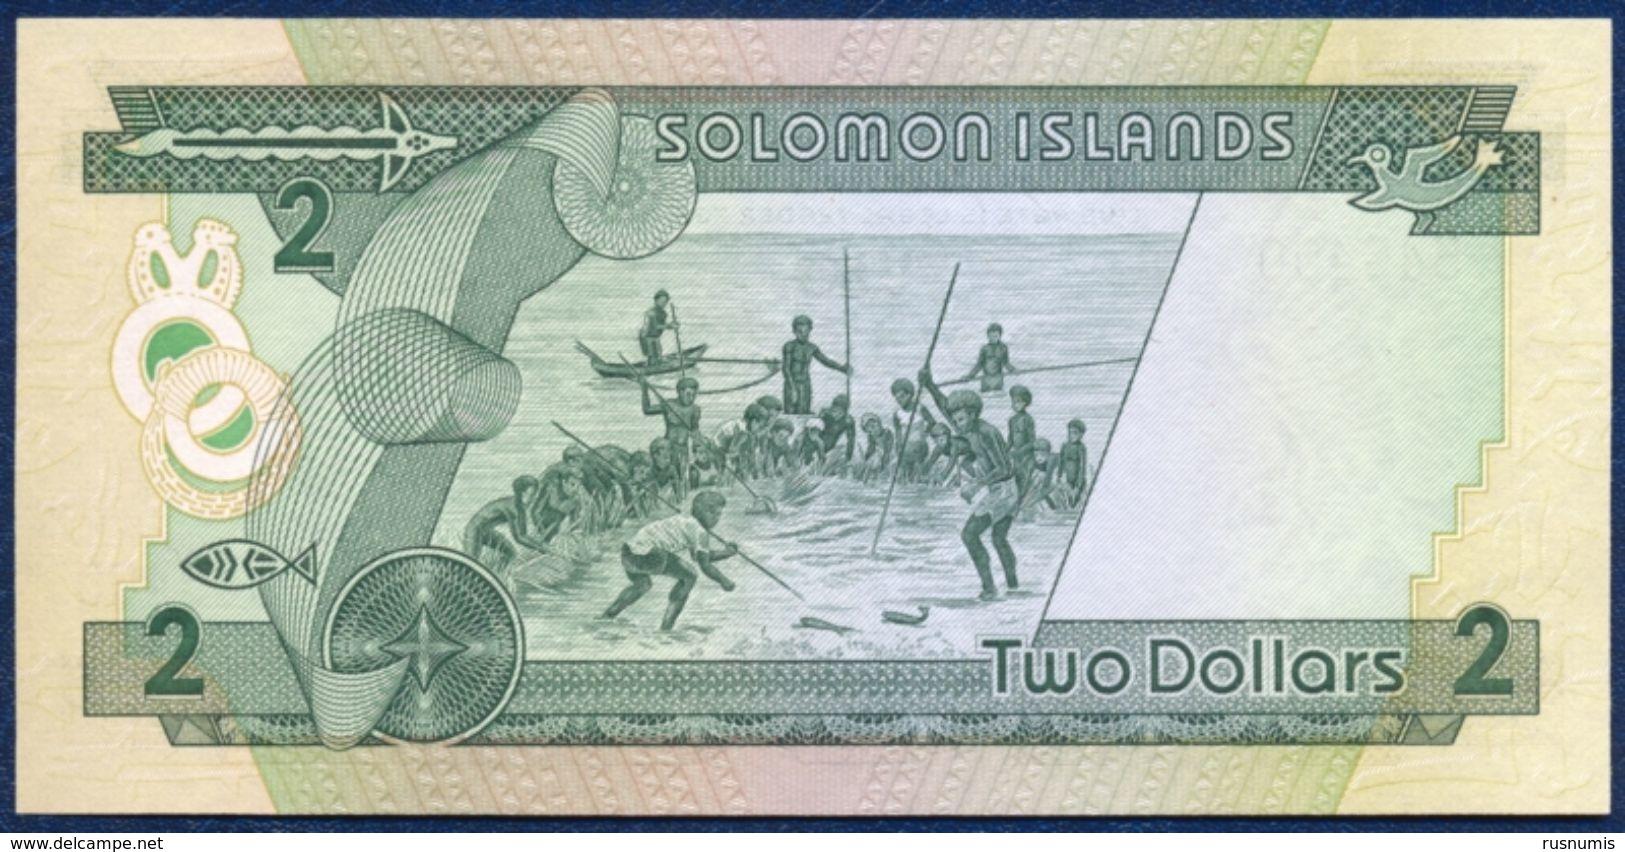 SOLOMON ISLANDS 2 DOLLARS P-13 FISHING 1986 UNC - Solomon Islands